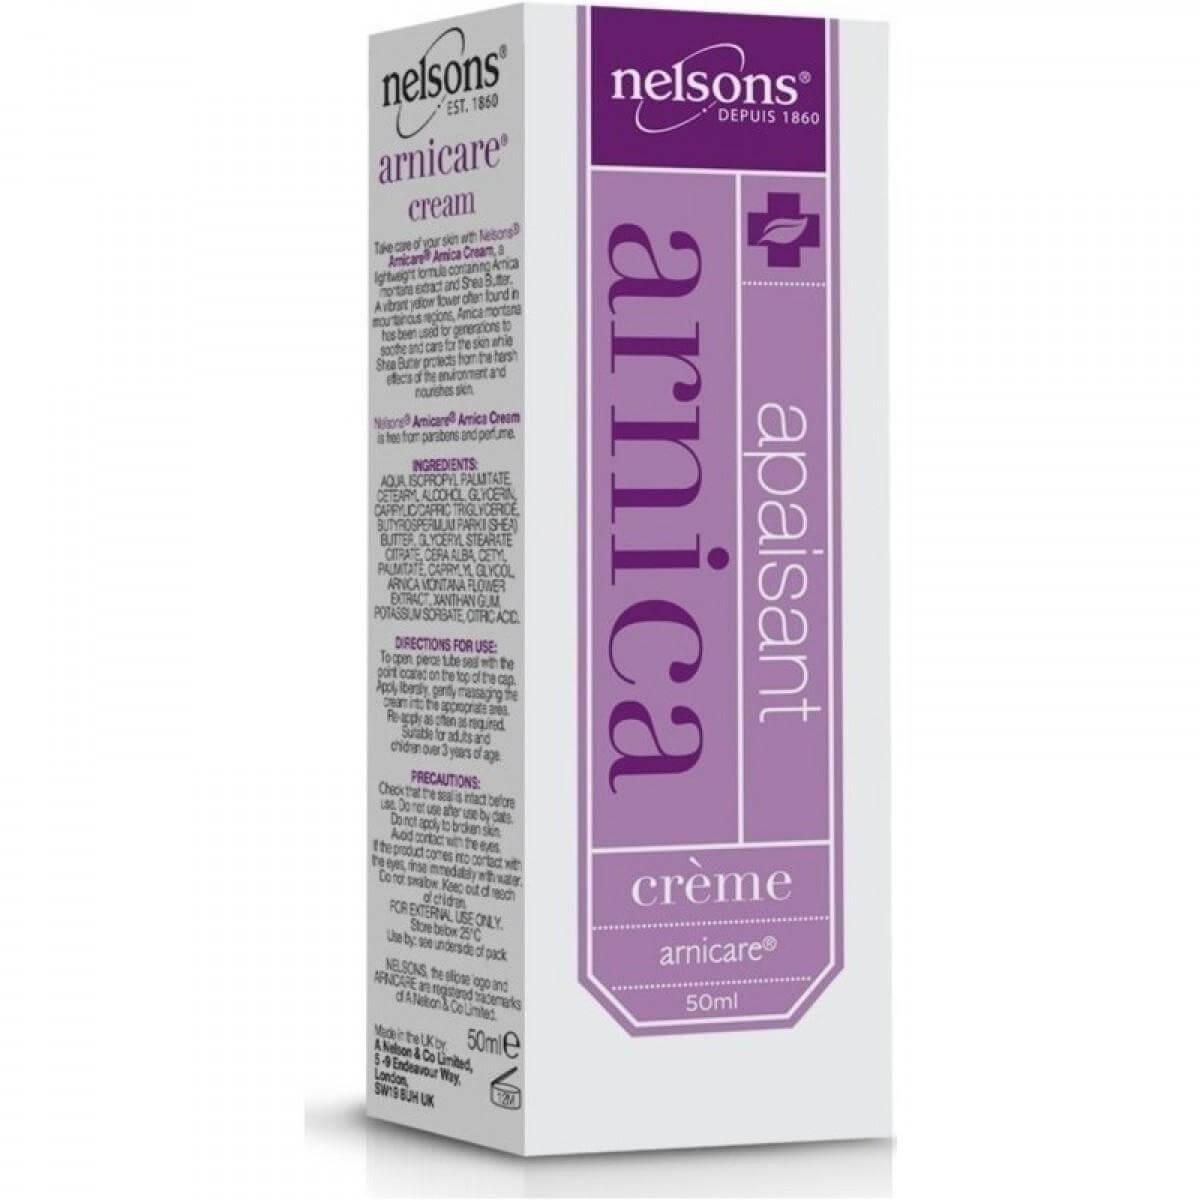 Power Health Arnica Soothing Cream Κρέμα για Μώλωπες & Διαστρέμματα με Εκχύλισμα φαρμακείο   αυτοθεραπεία   τραύματα ουλές εγκαύματα